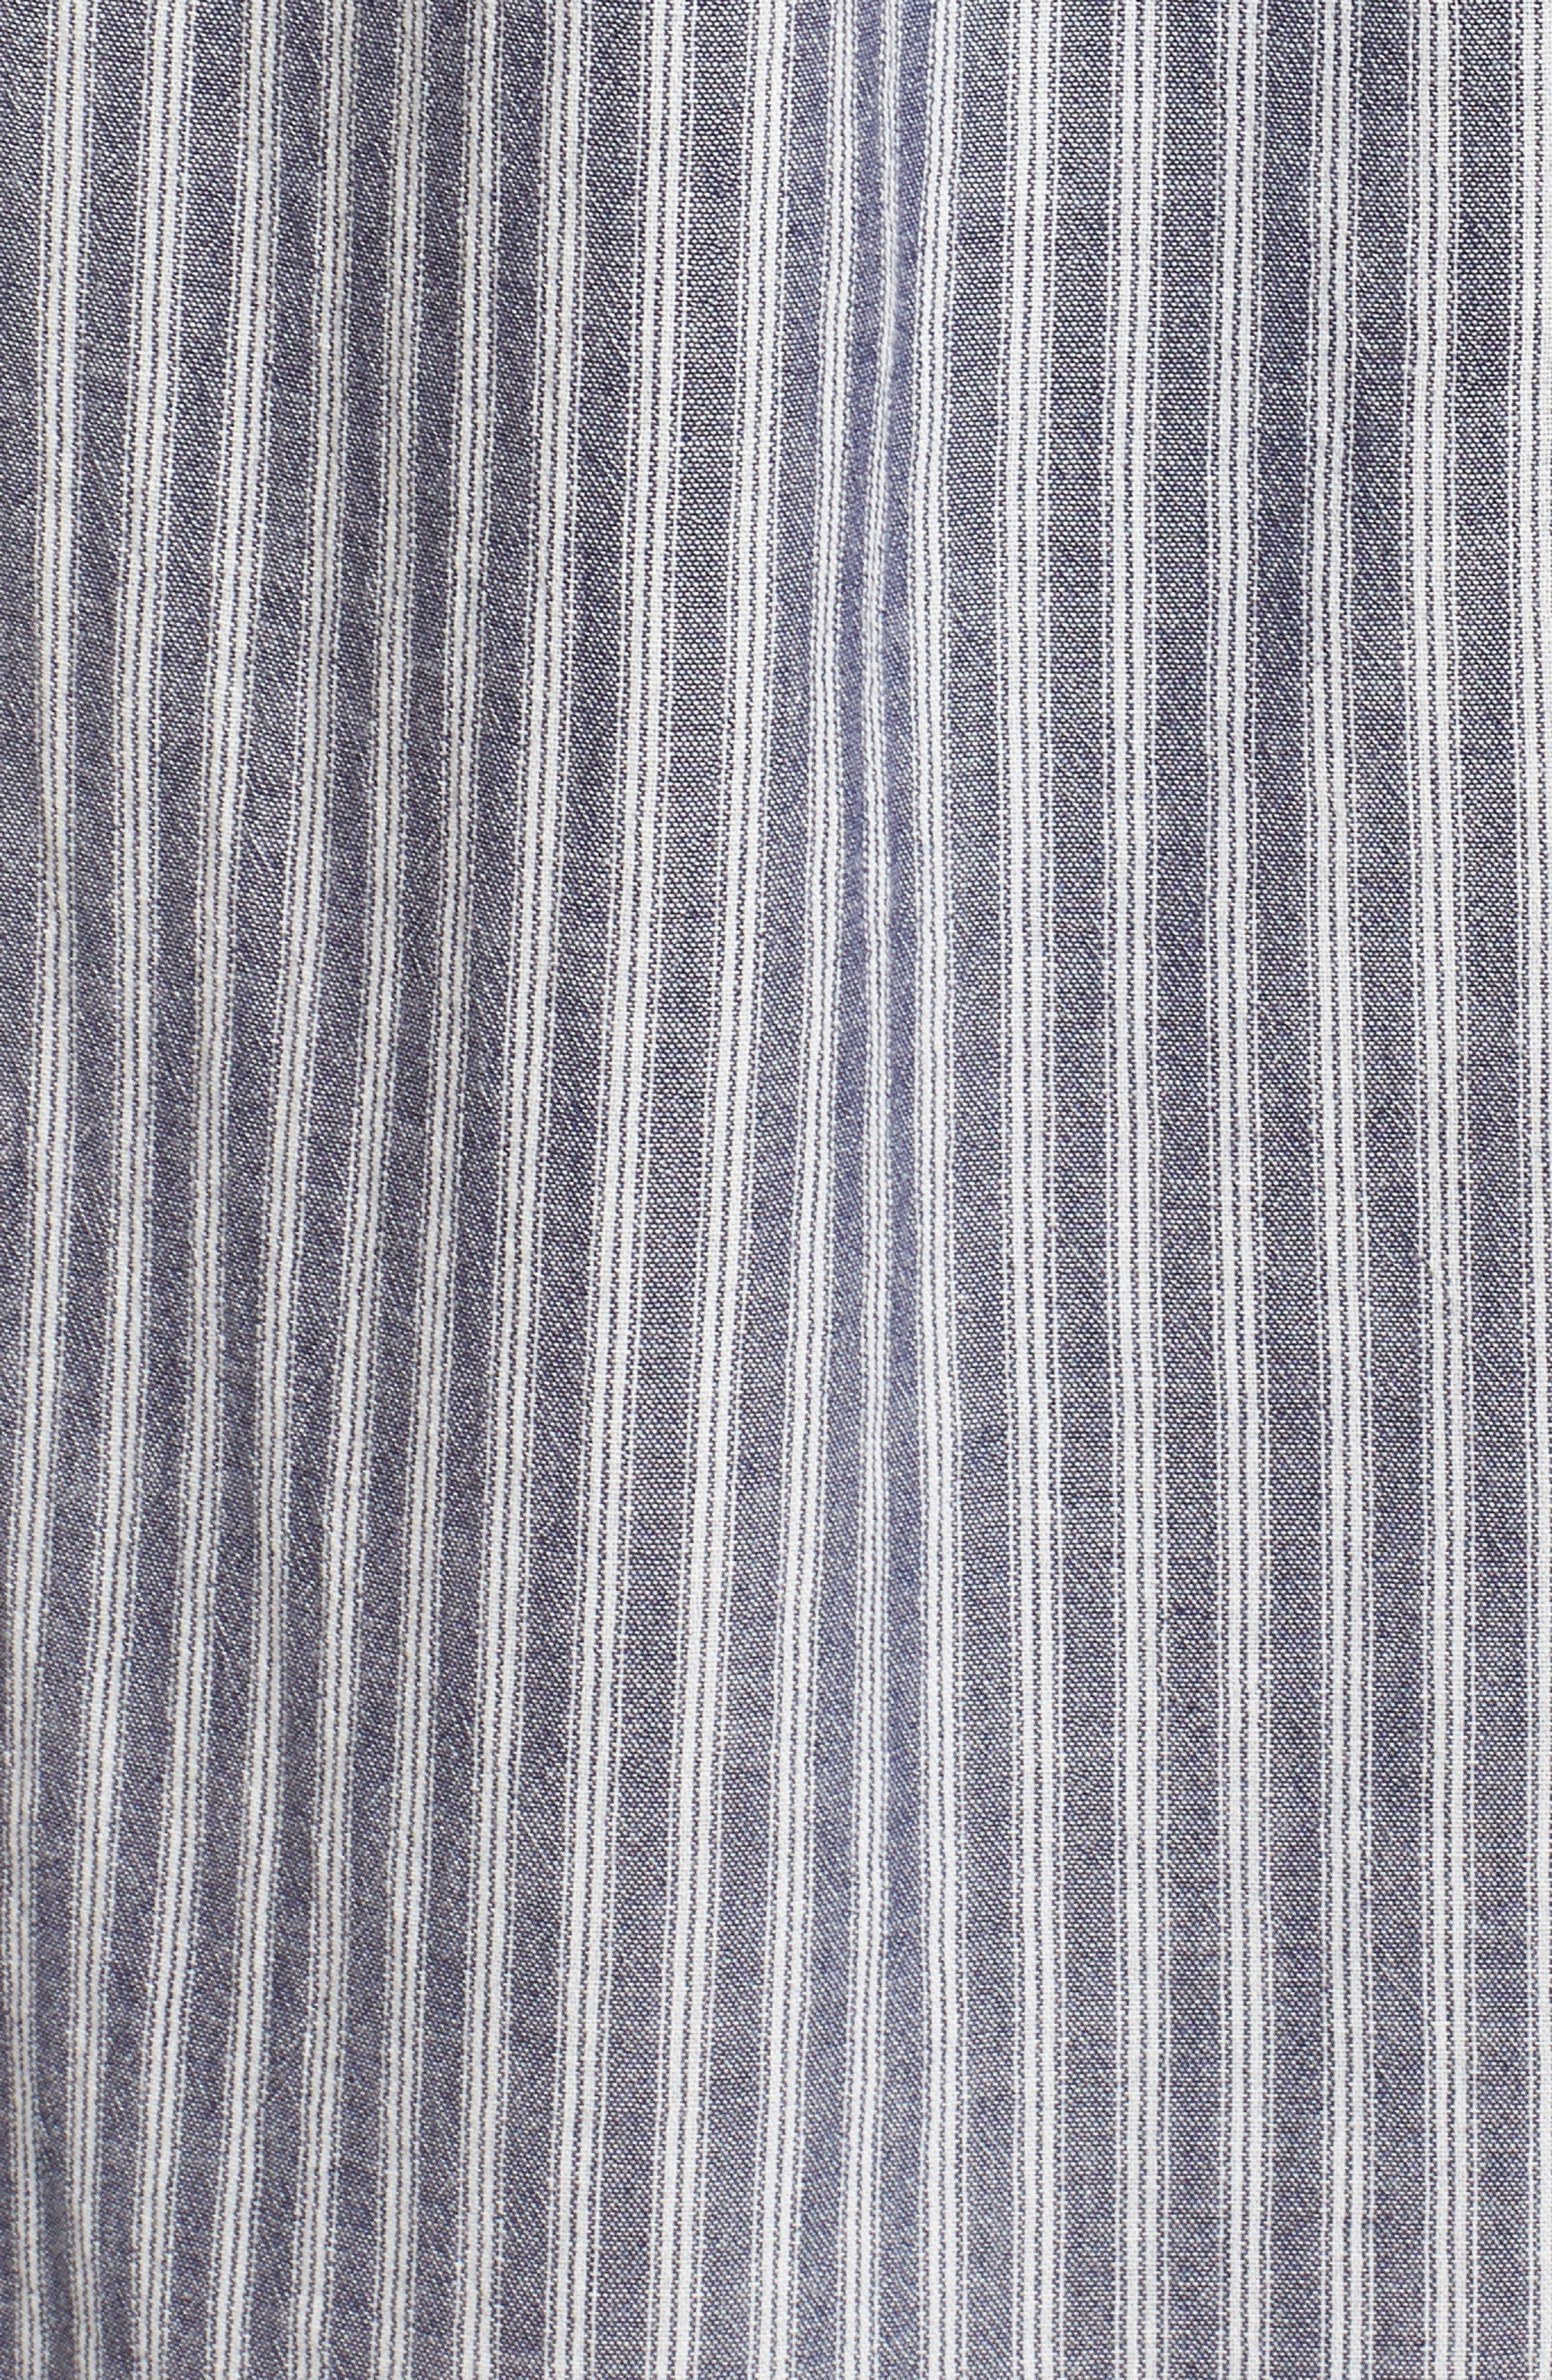 Carmel Smocked Off the Shoulder Maxi Dress,                             Alternate thumbnail 6, color,                             Chambray